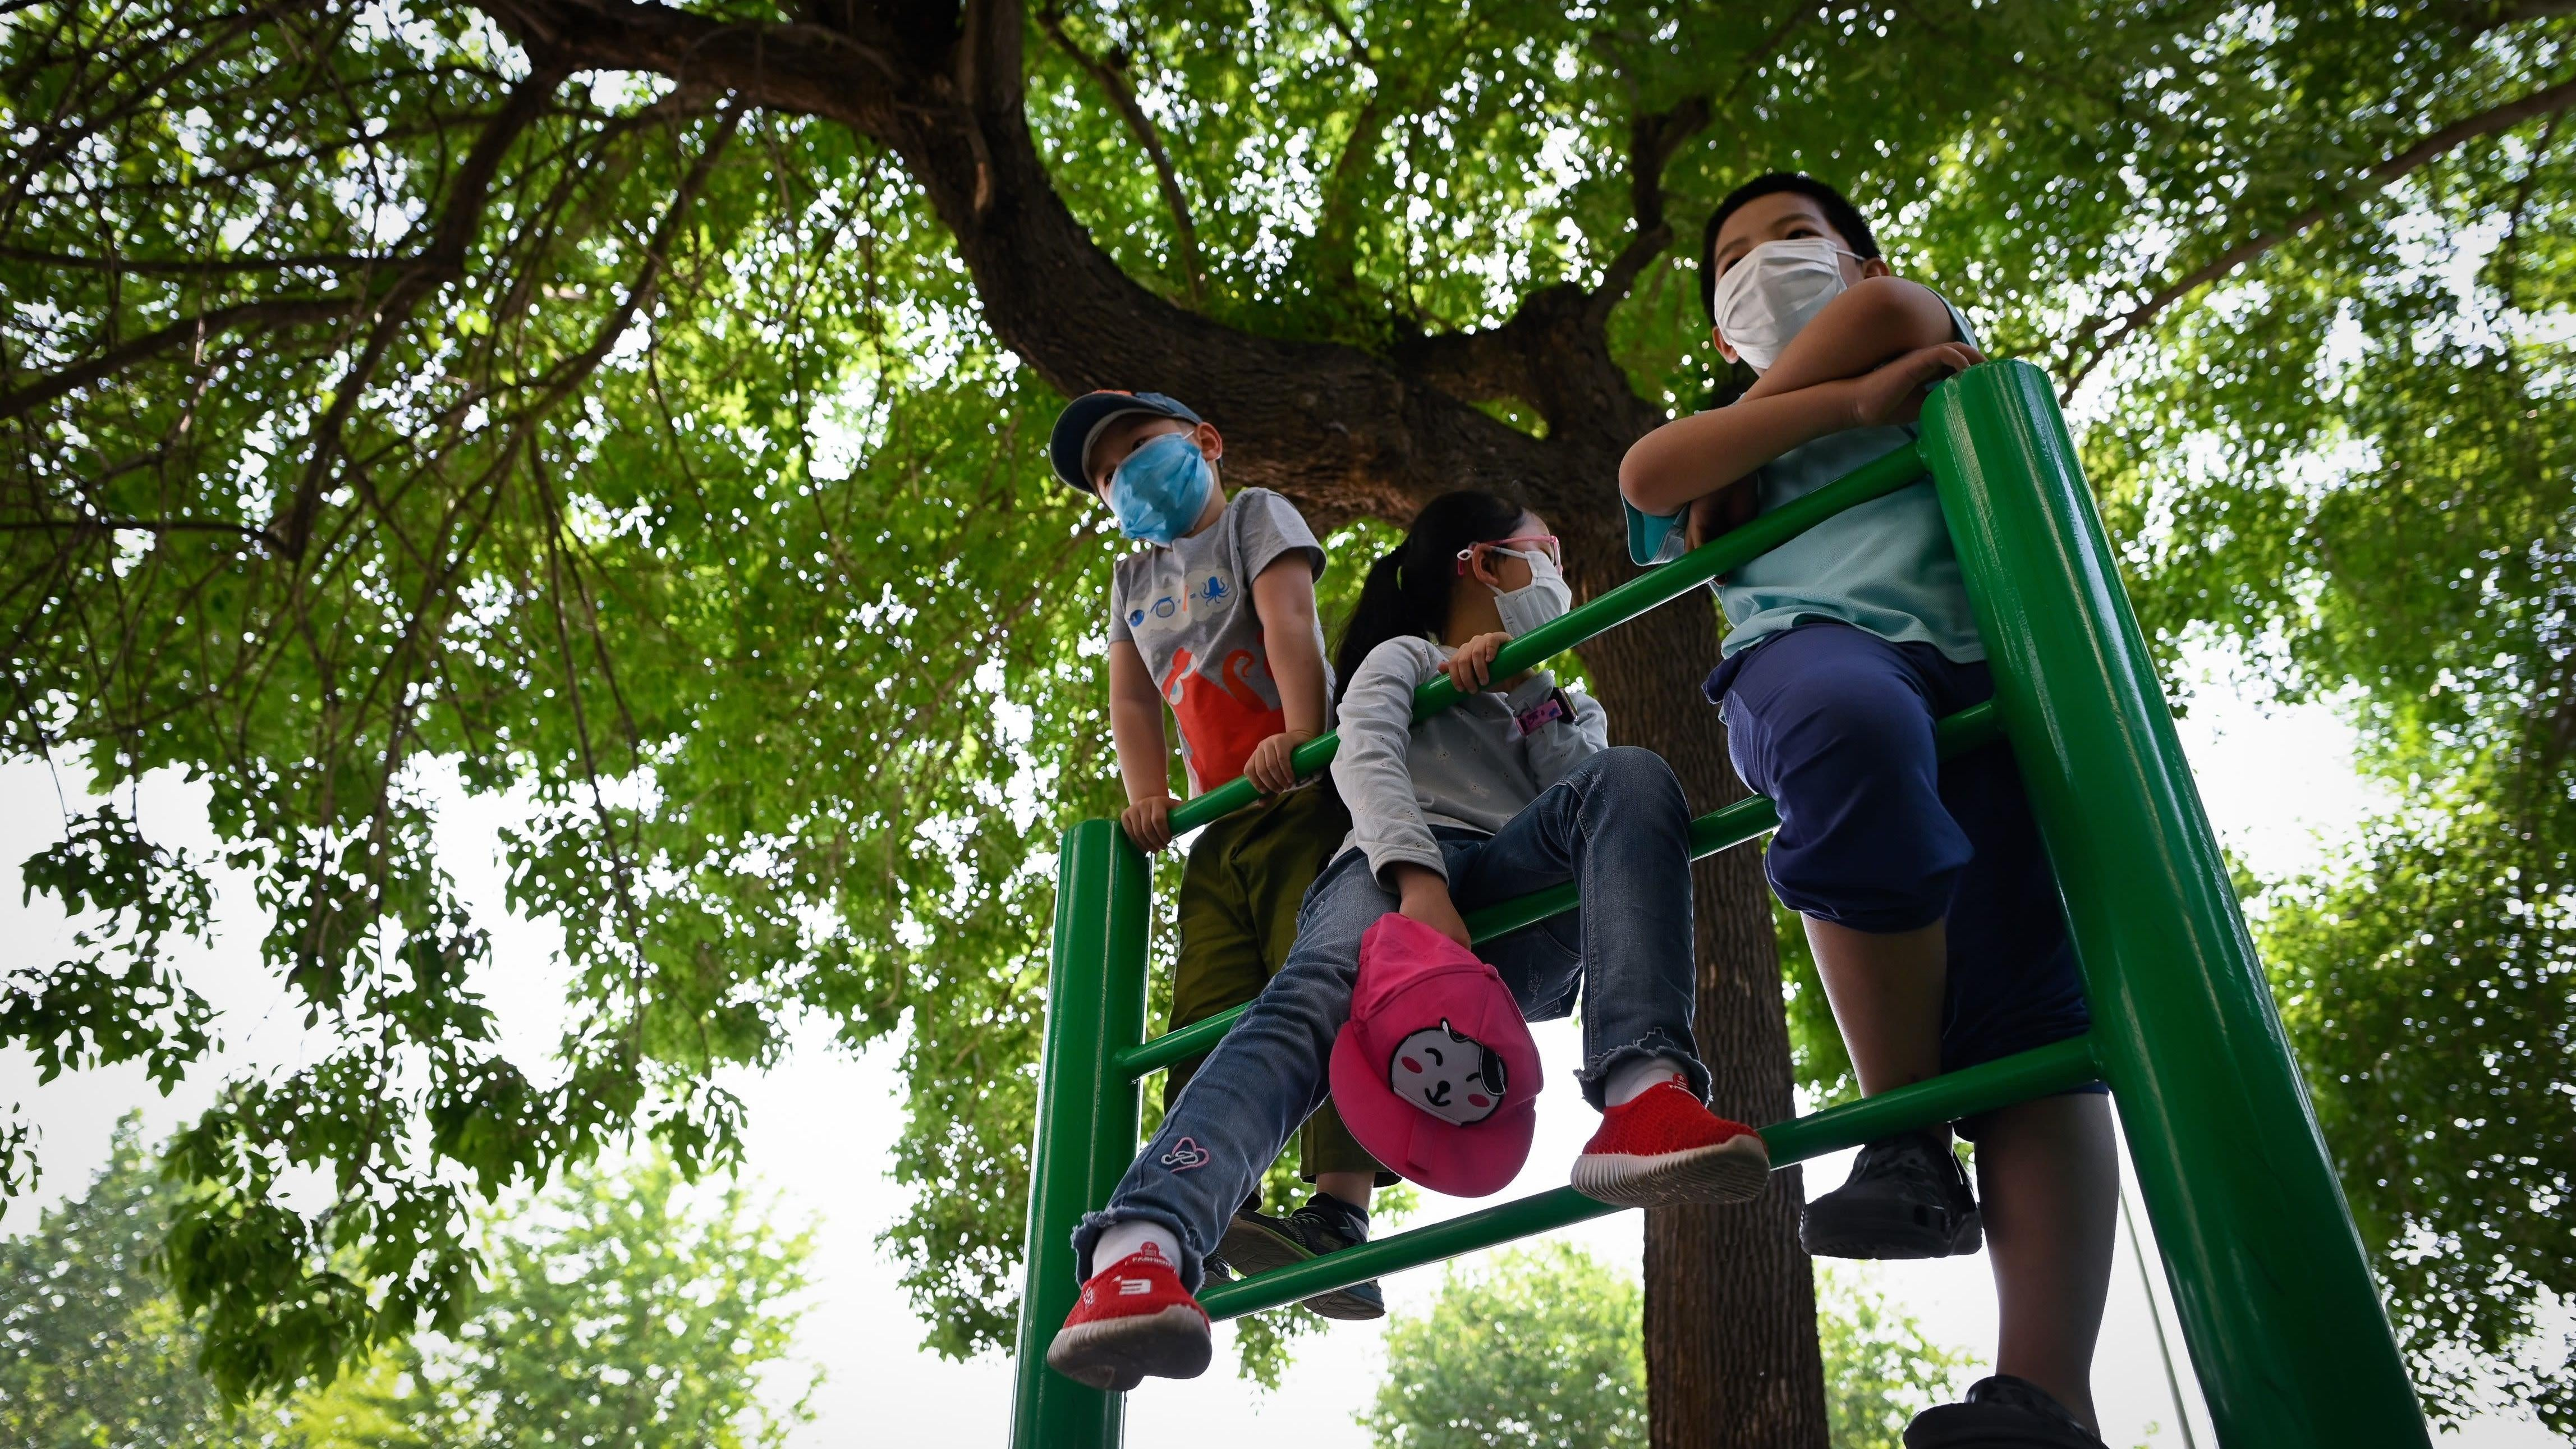 Doctors In Europe Warn Of Link Between Covid-19 And Toxic Shock Symptoms In Children